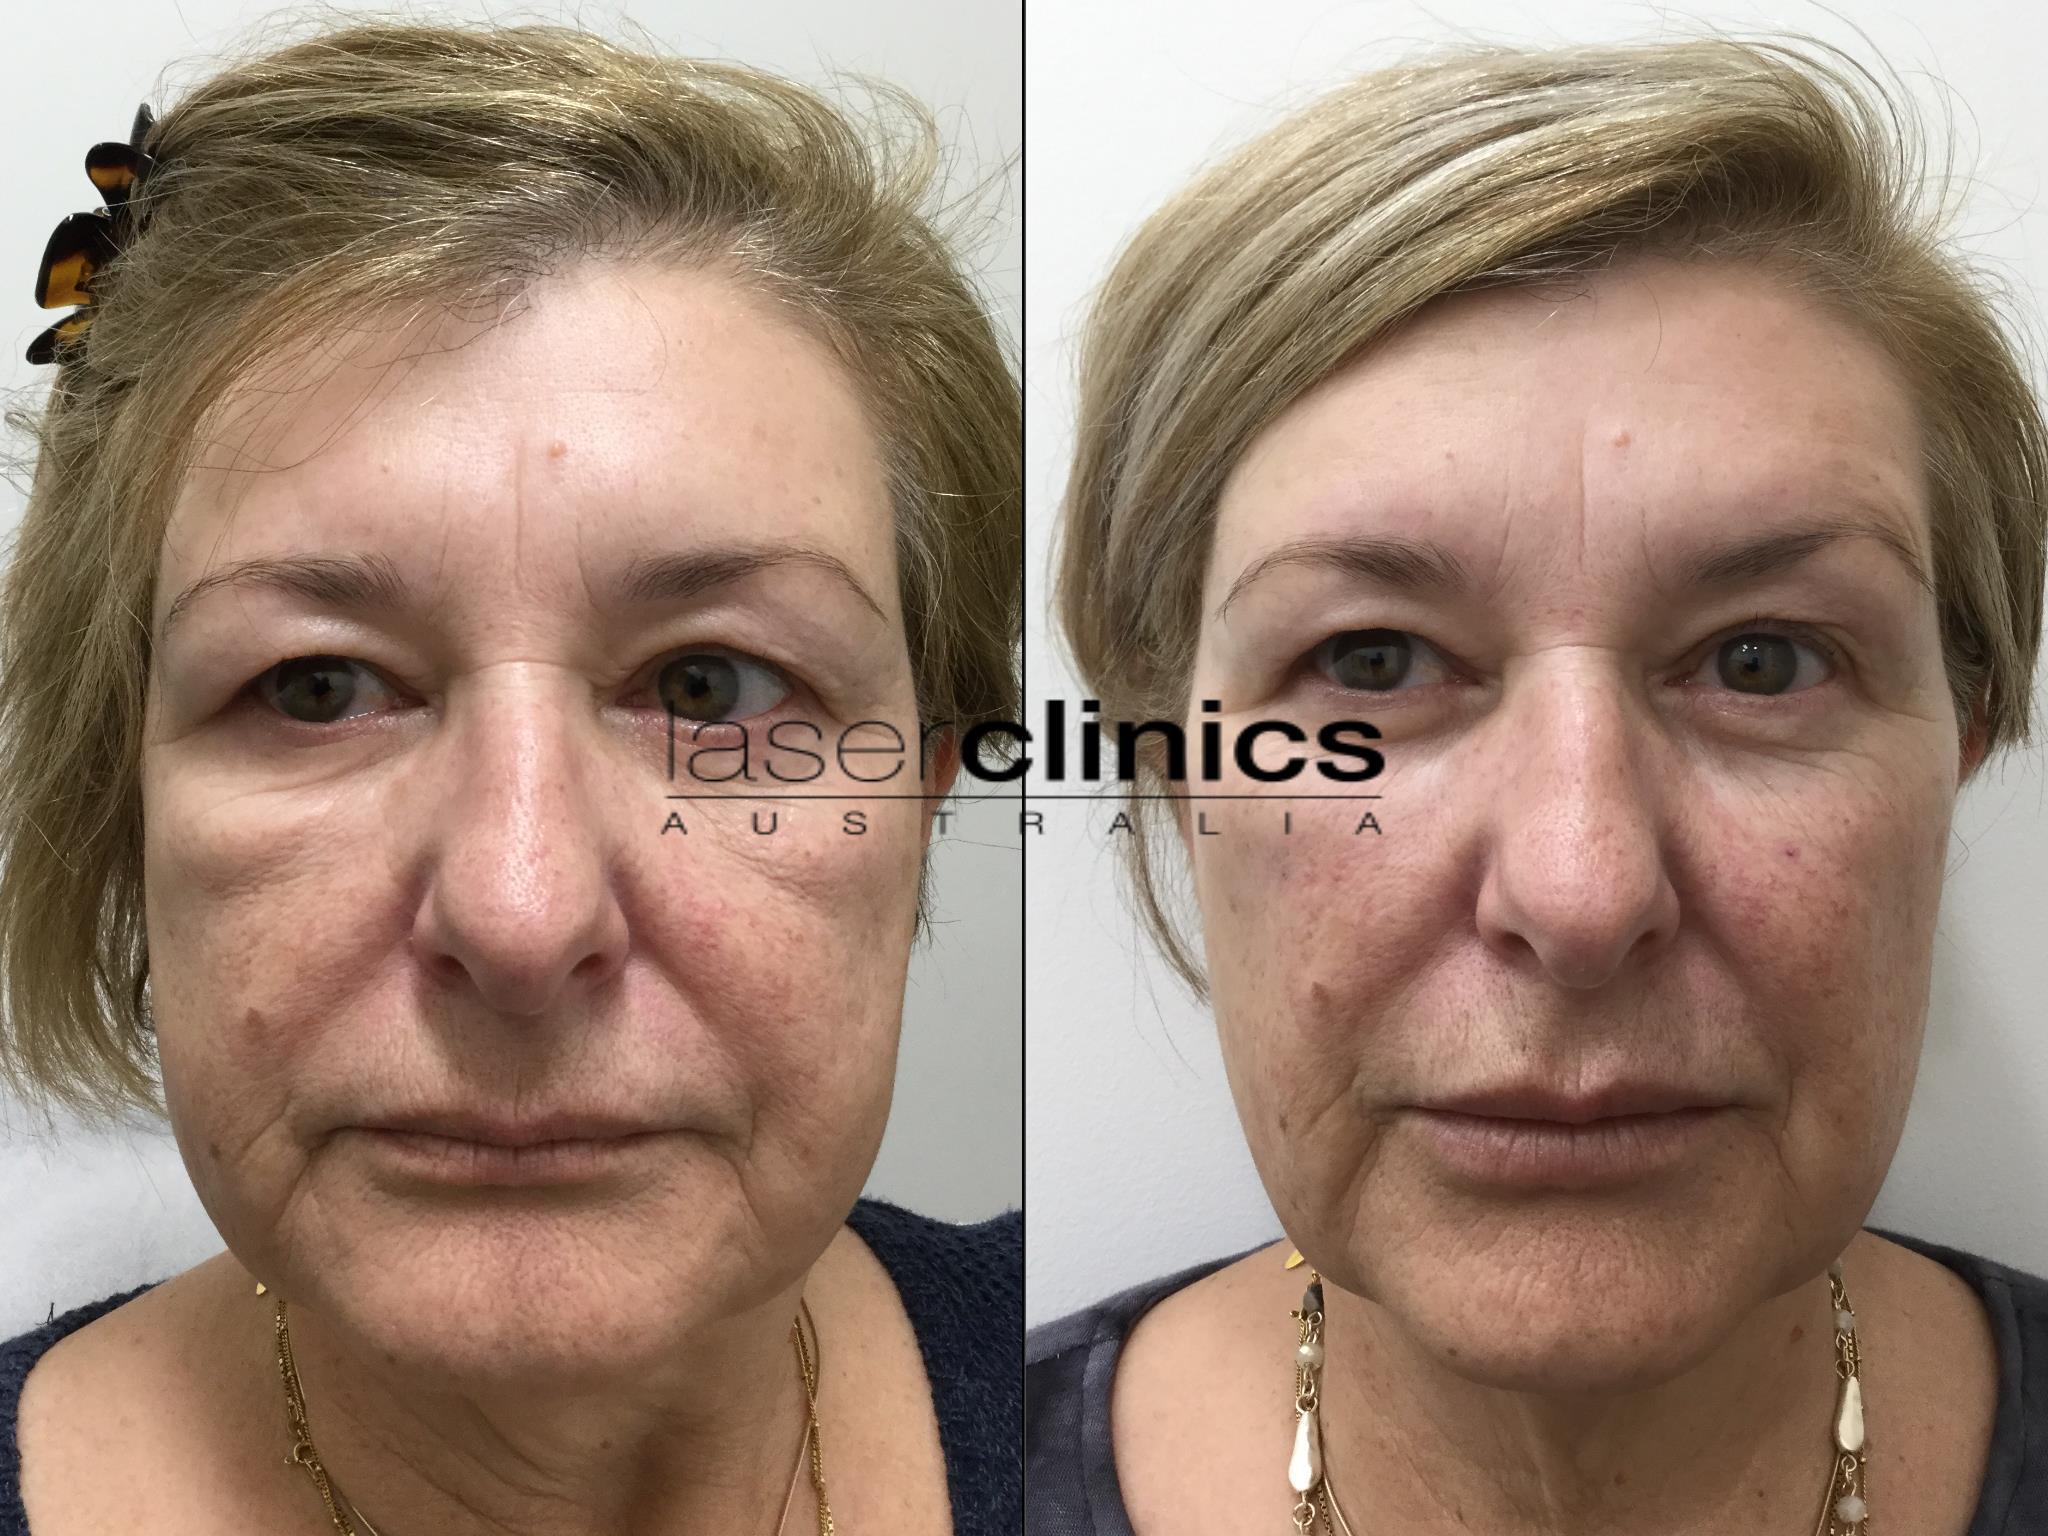 Noosa | Laser Clinics Australia